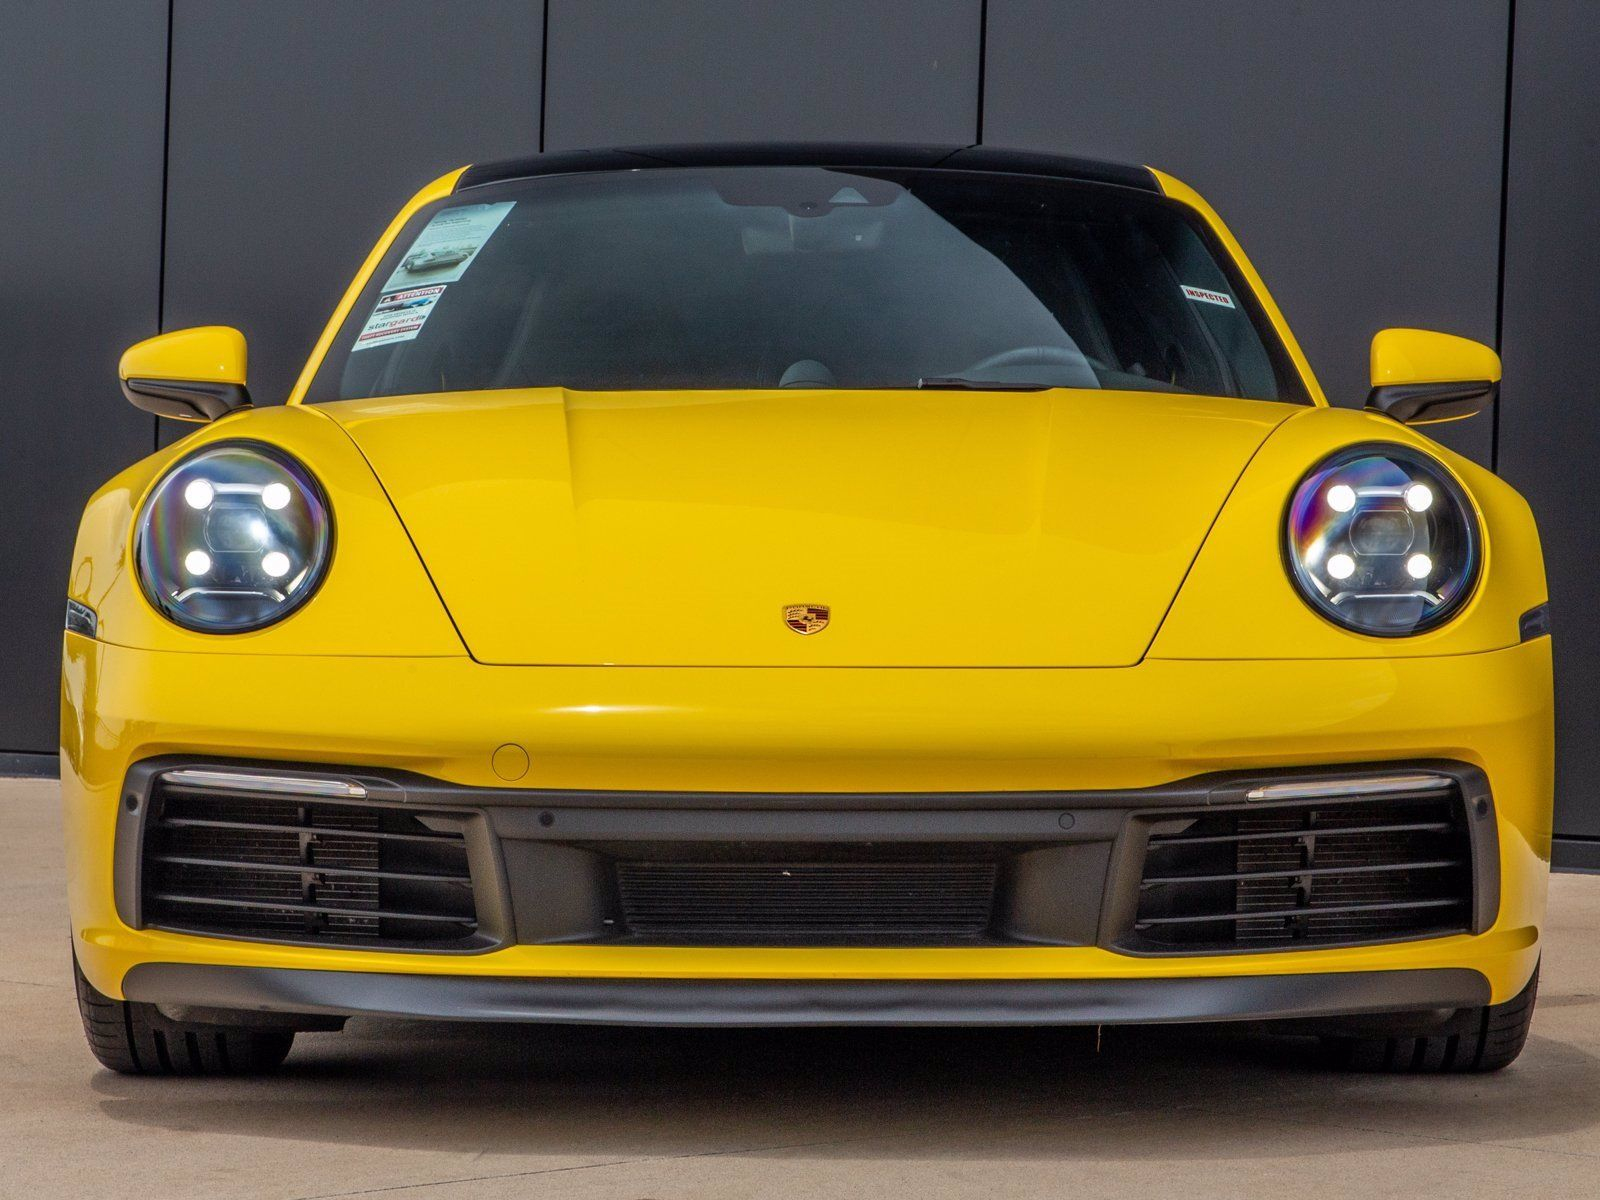 2020 Porsche 911 Carrera S (992) – 4